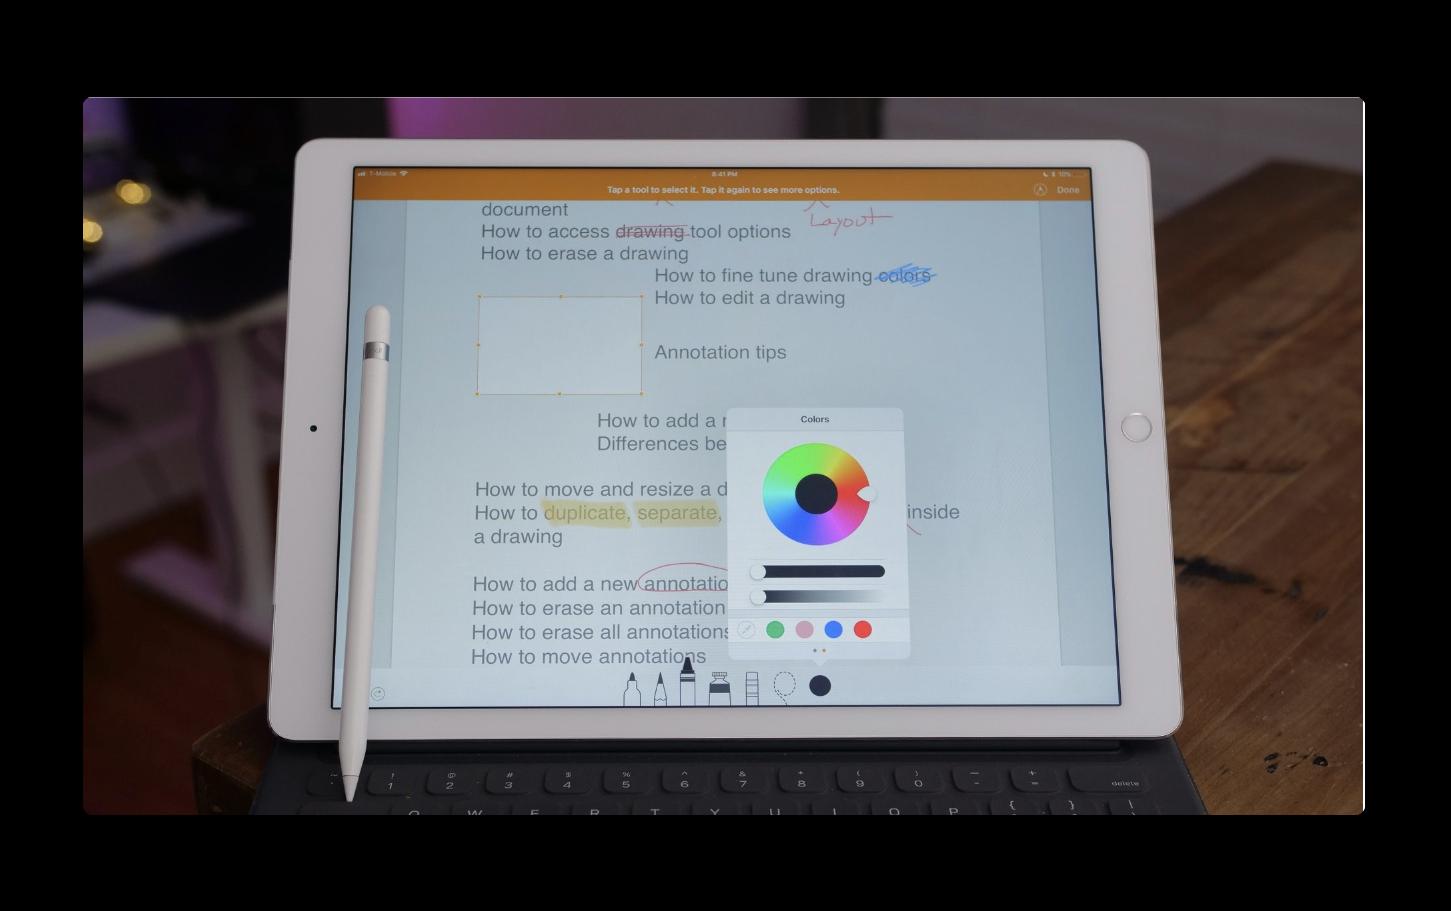 iPadのPagesで新しい図面とスマートアノテーション機能を使用するビデオが公開